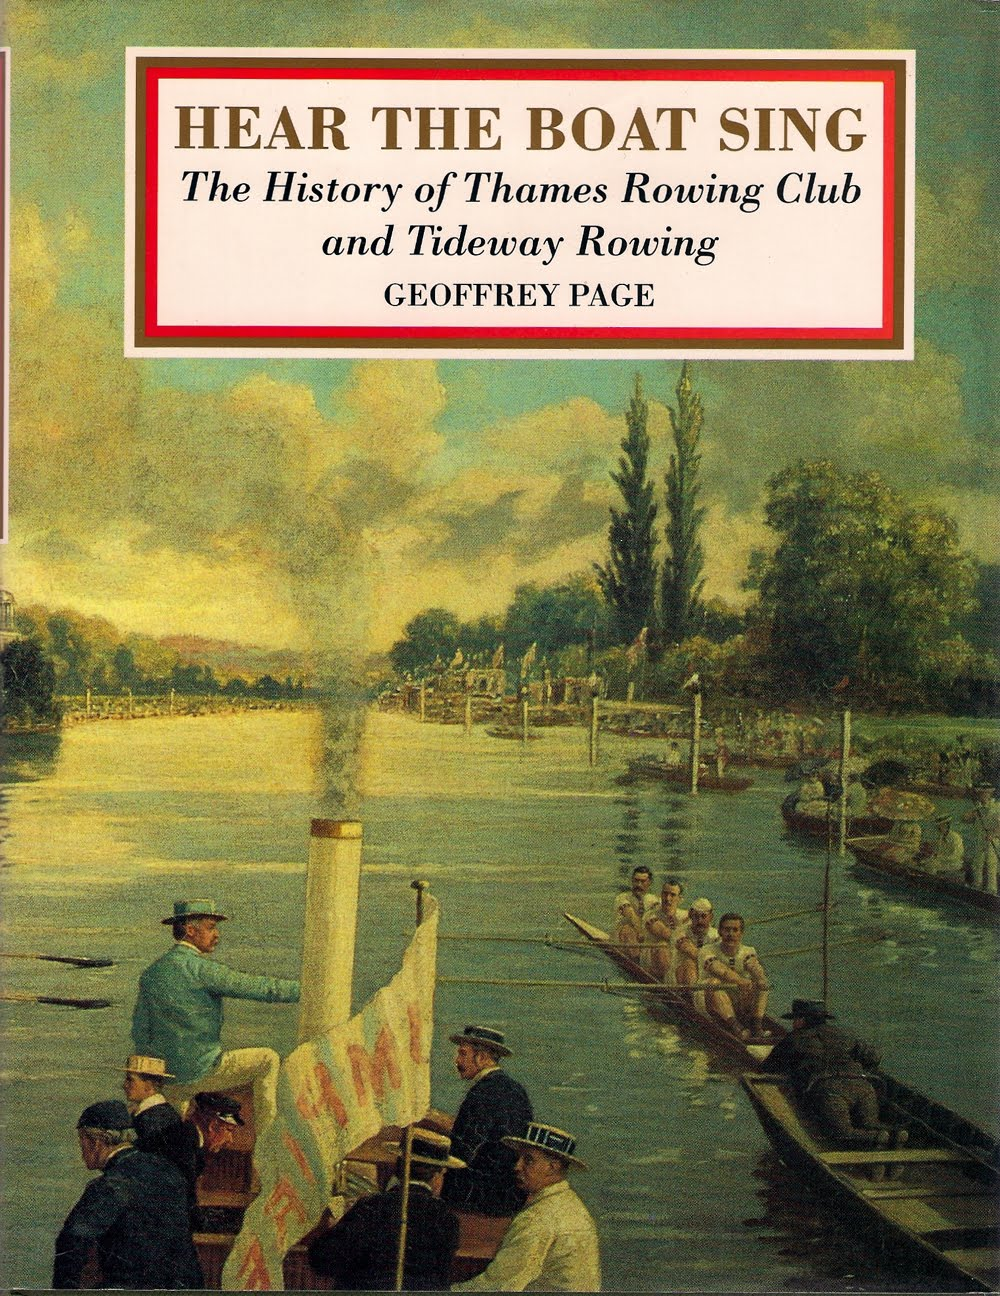 Writing a club history book